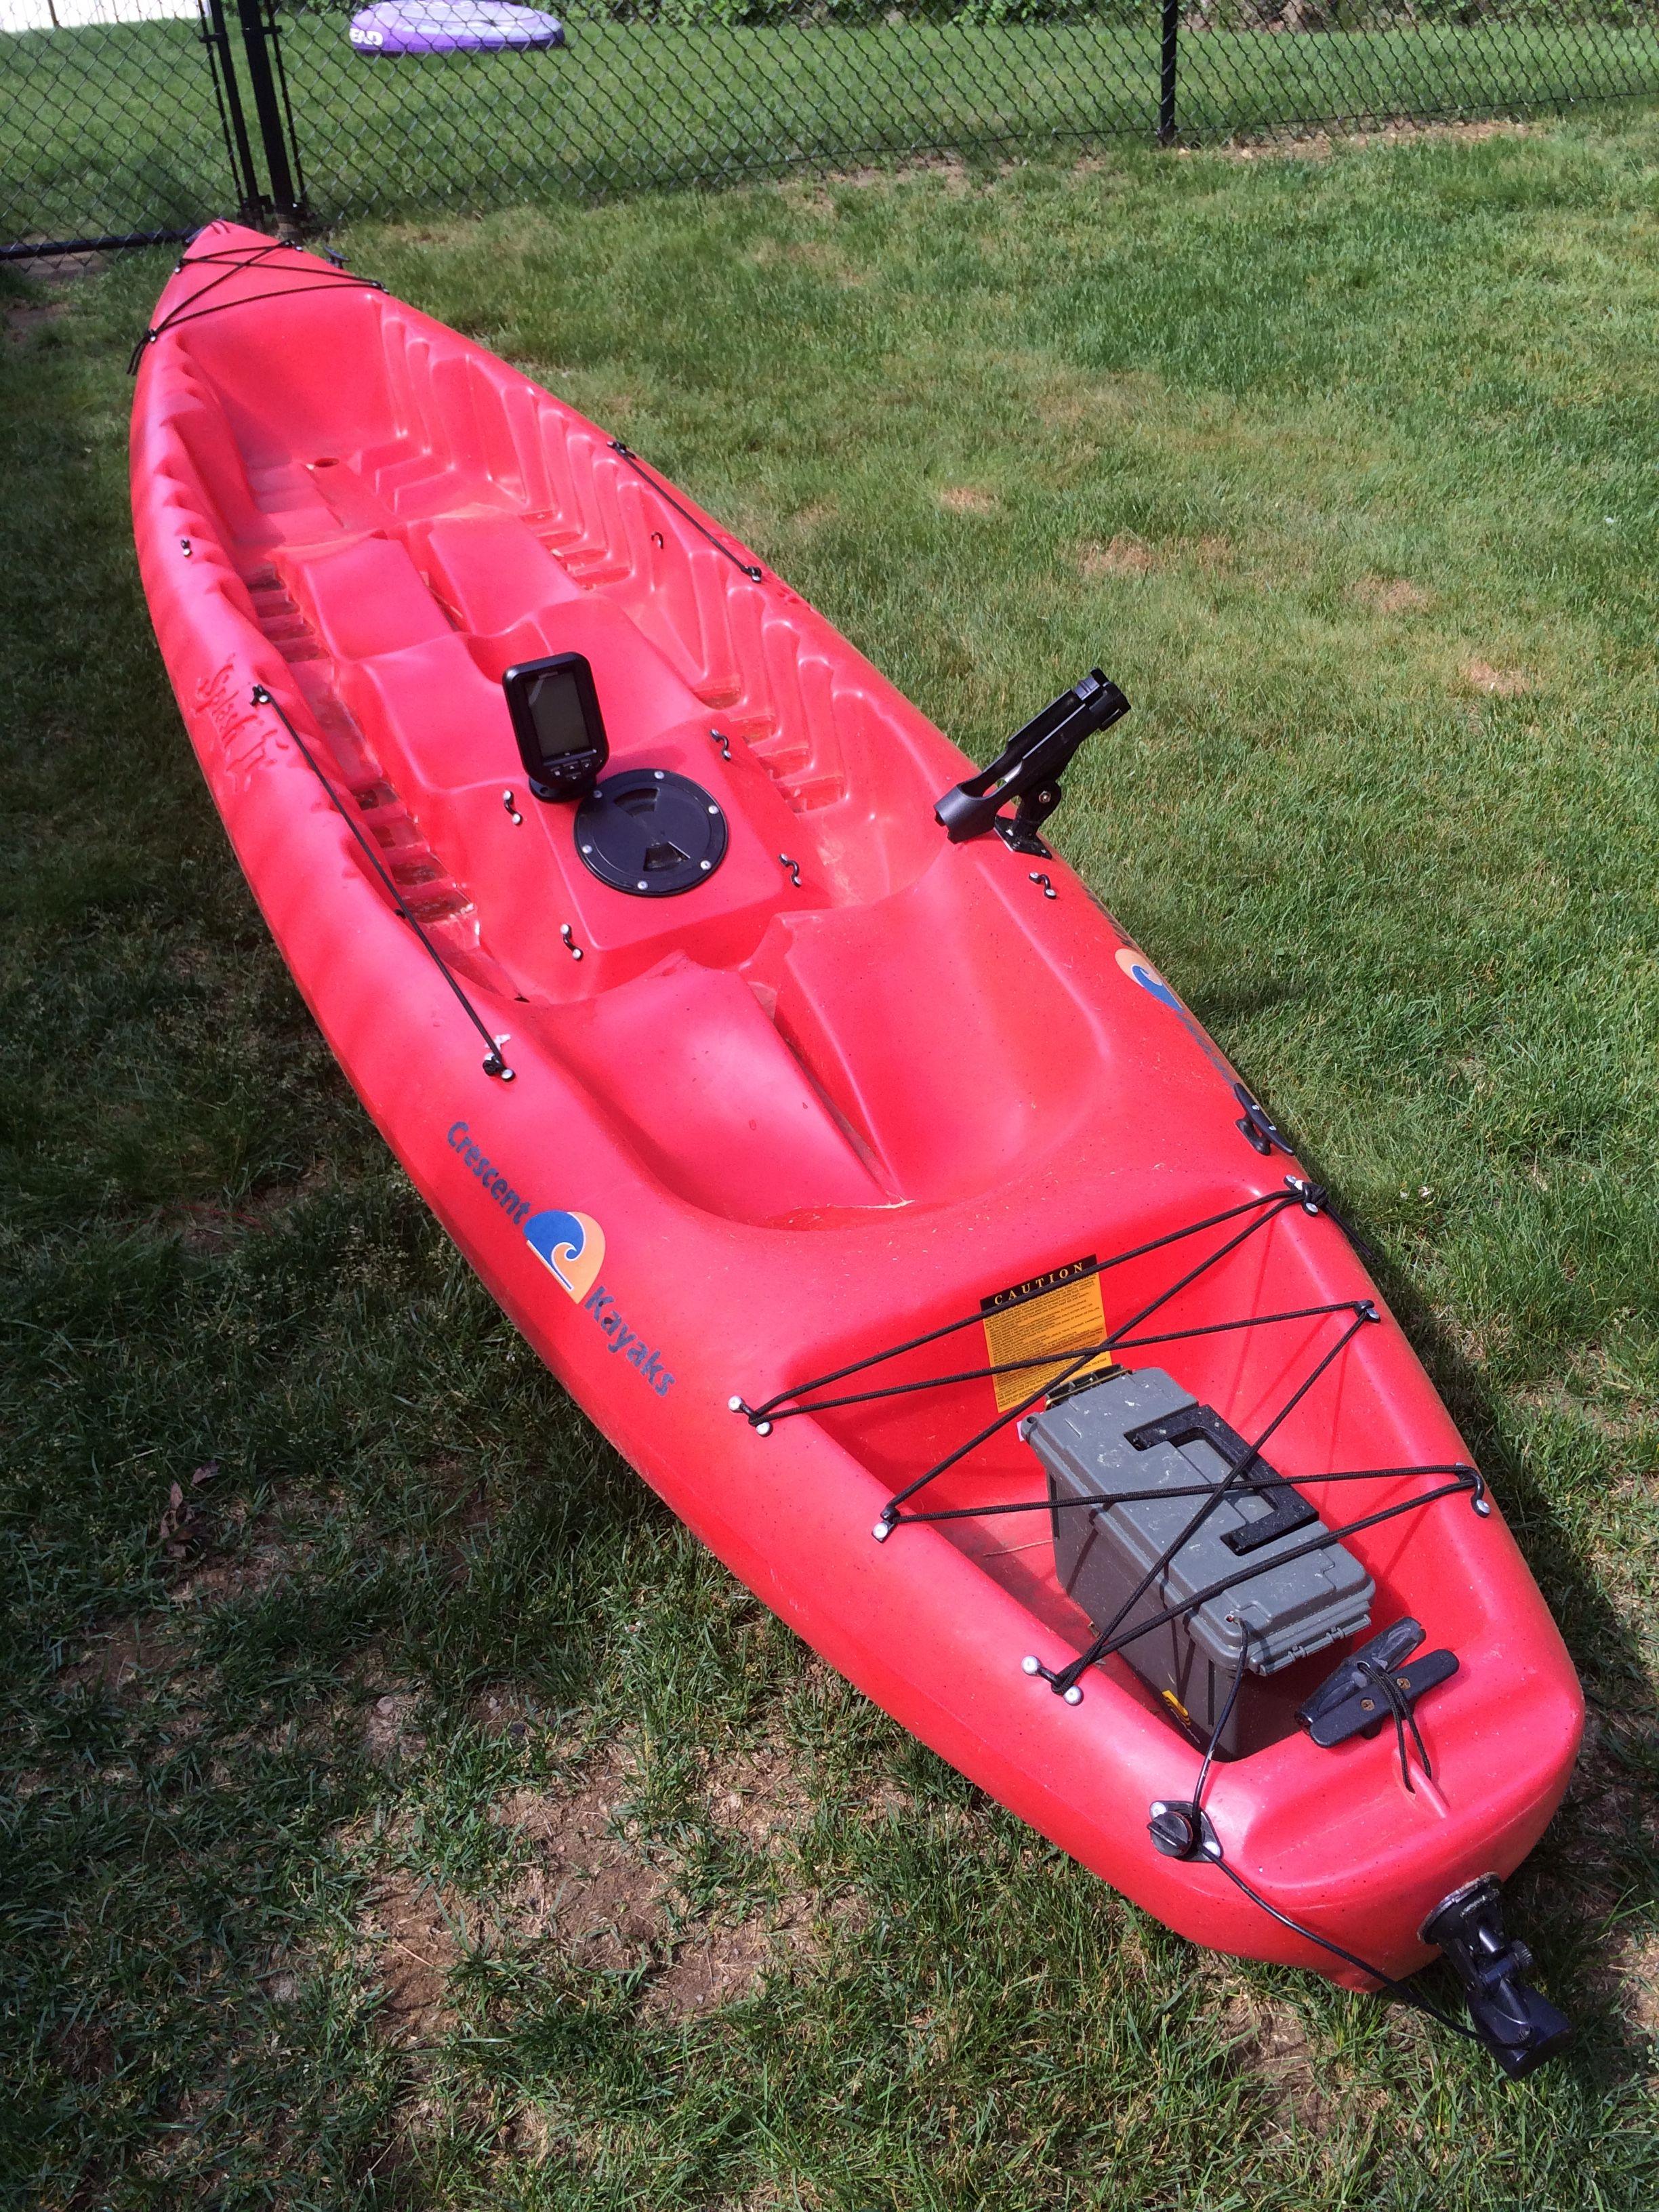 Crescent Kayak Splash II 3 person, with fish finder « Kayak